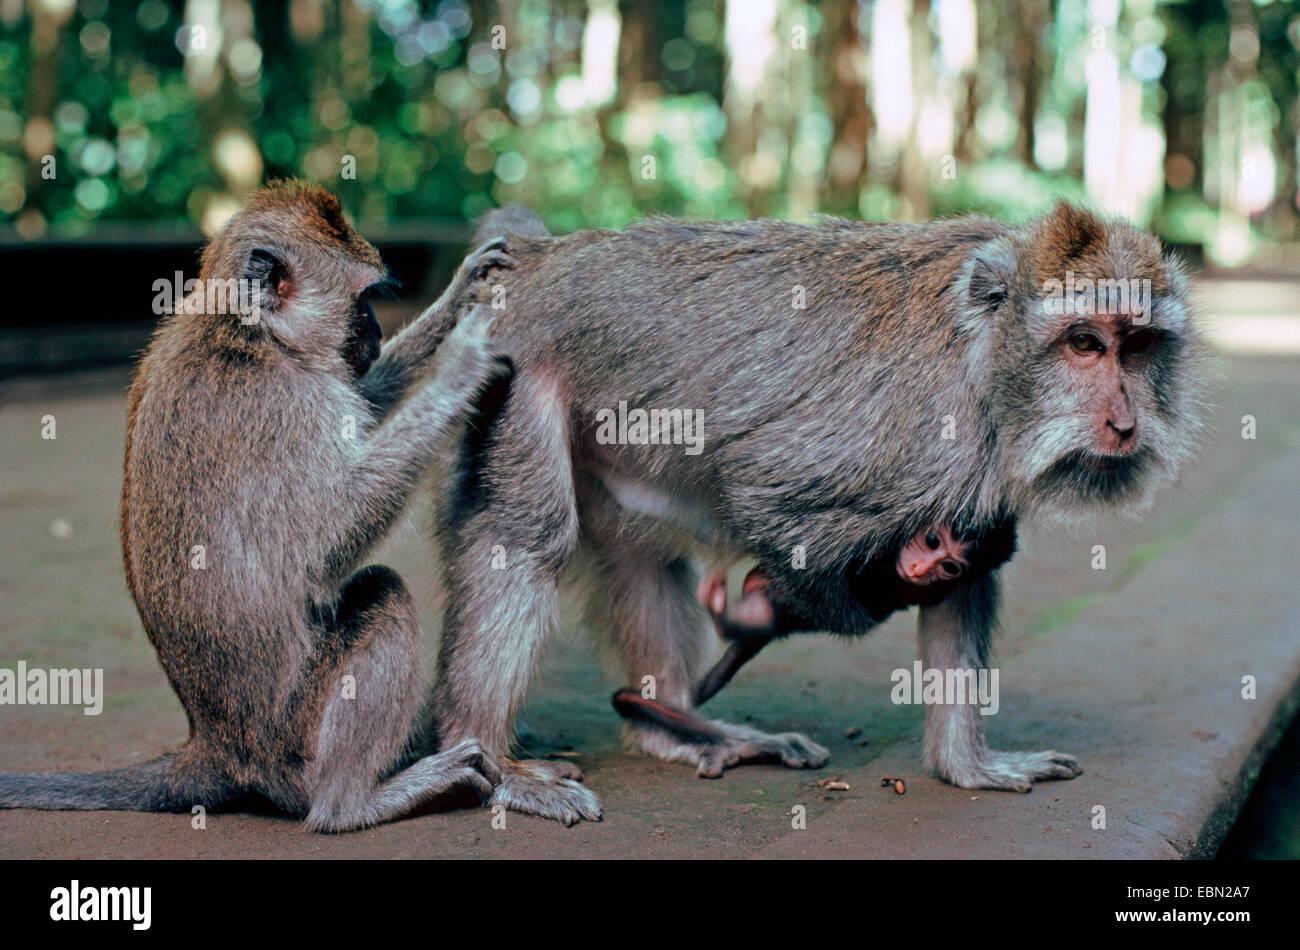 Crab-eating Macaque, Java Macaque, Longtailed Macaque (Macaca fascicularis, Macaca irus), grooming - Stock Image